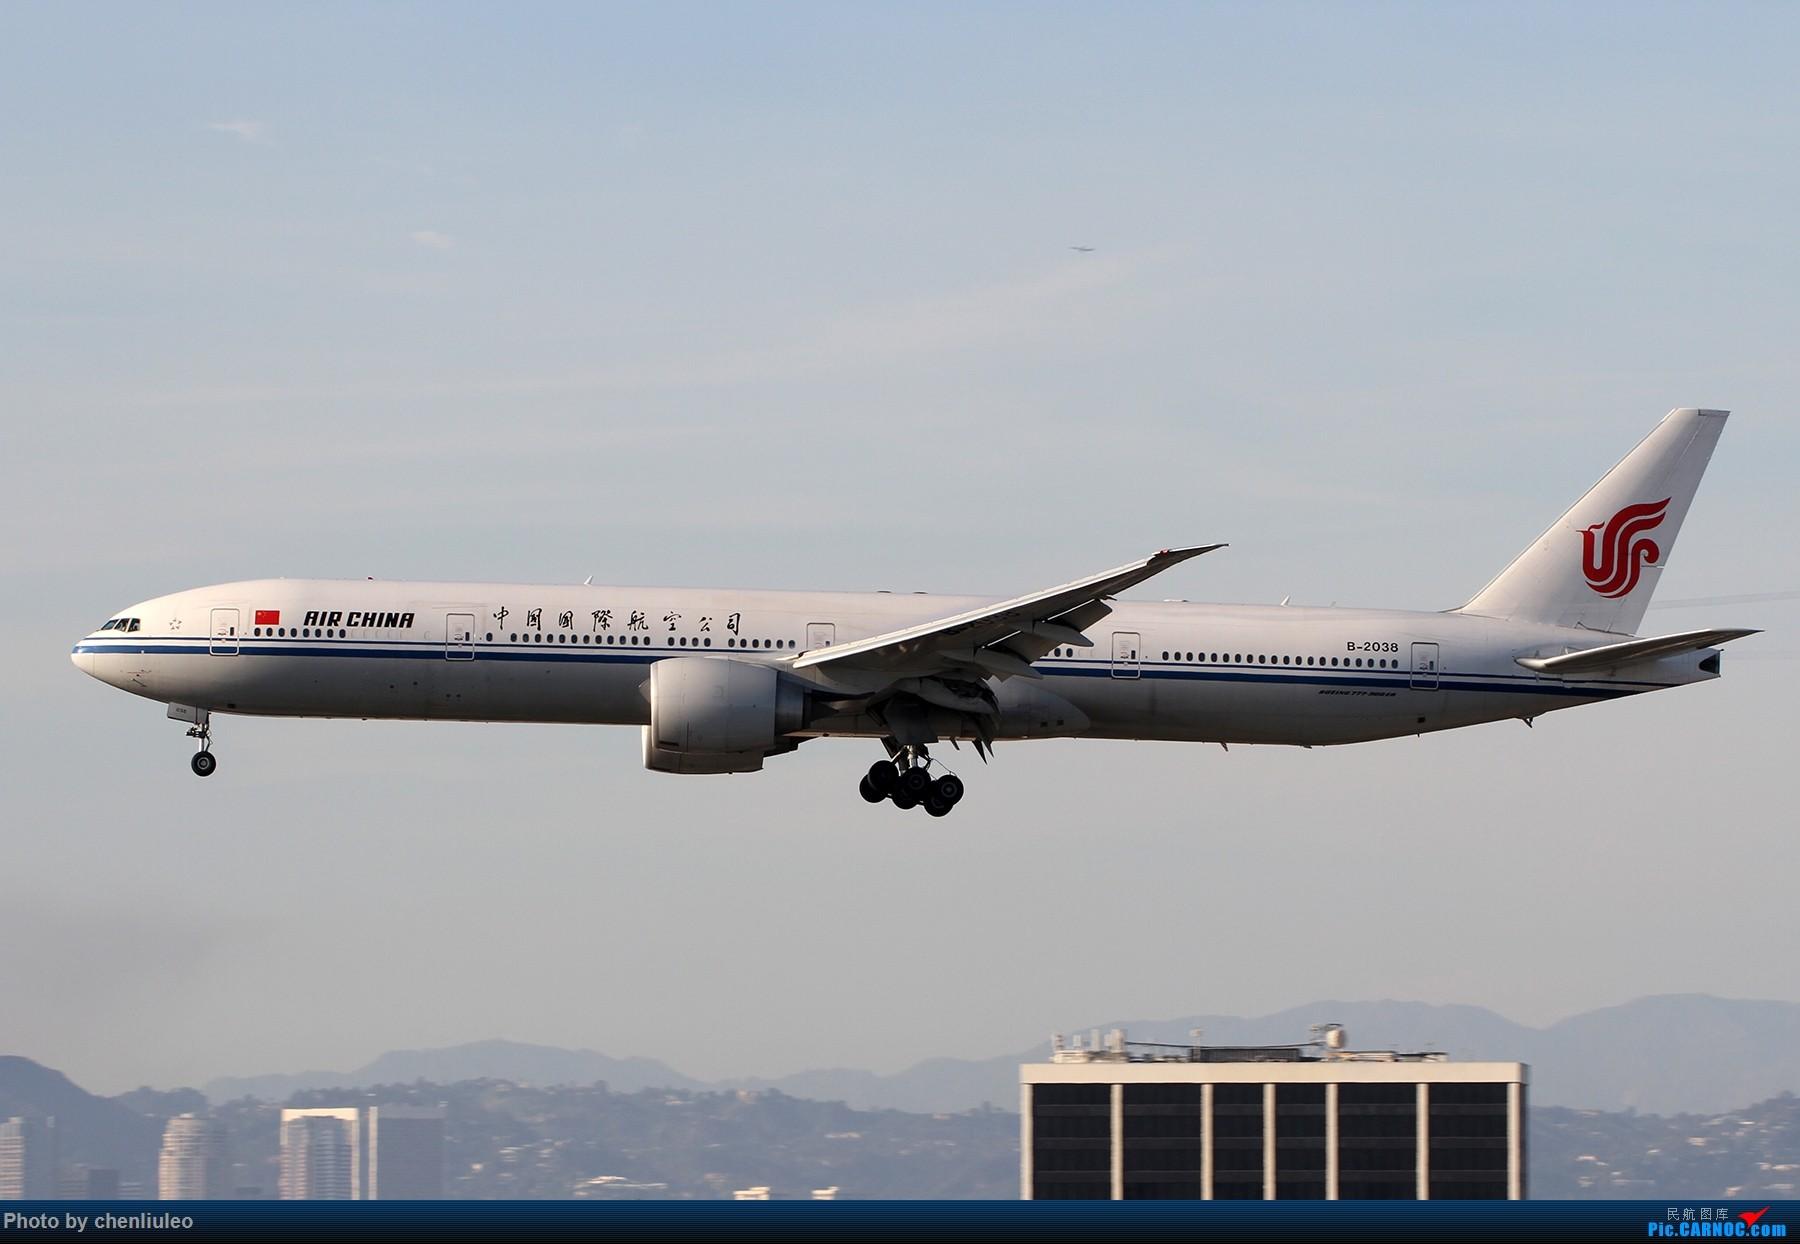 Re:[原创]【北美飞友会】全日空星球大战BB-8黄昏中降落LAX 以及一些杂图 BOEING 777-300ER B-2038 美国洛杉矶机场